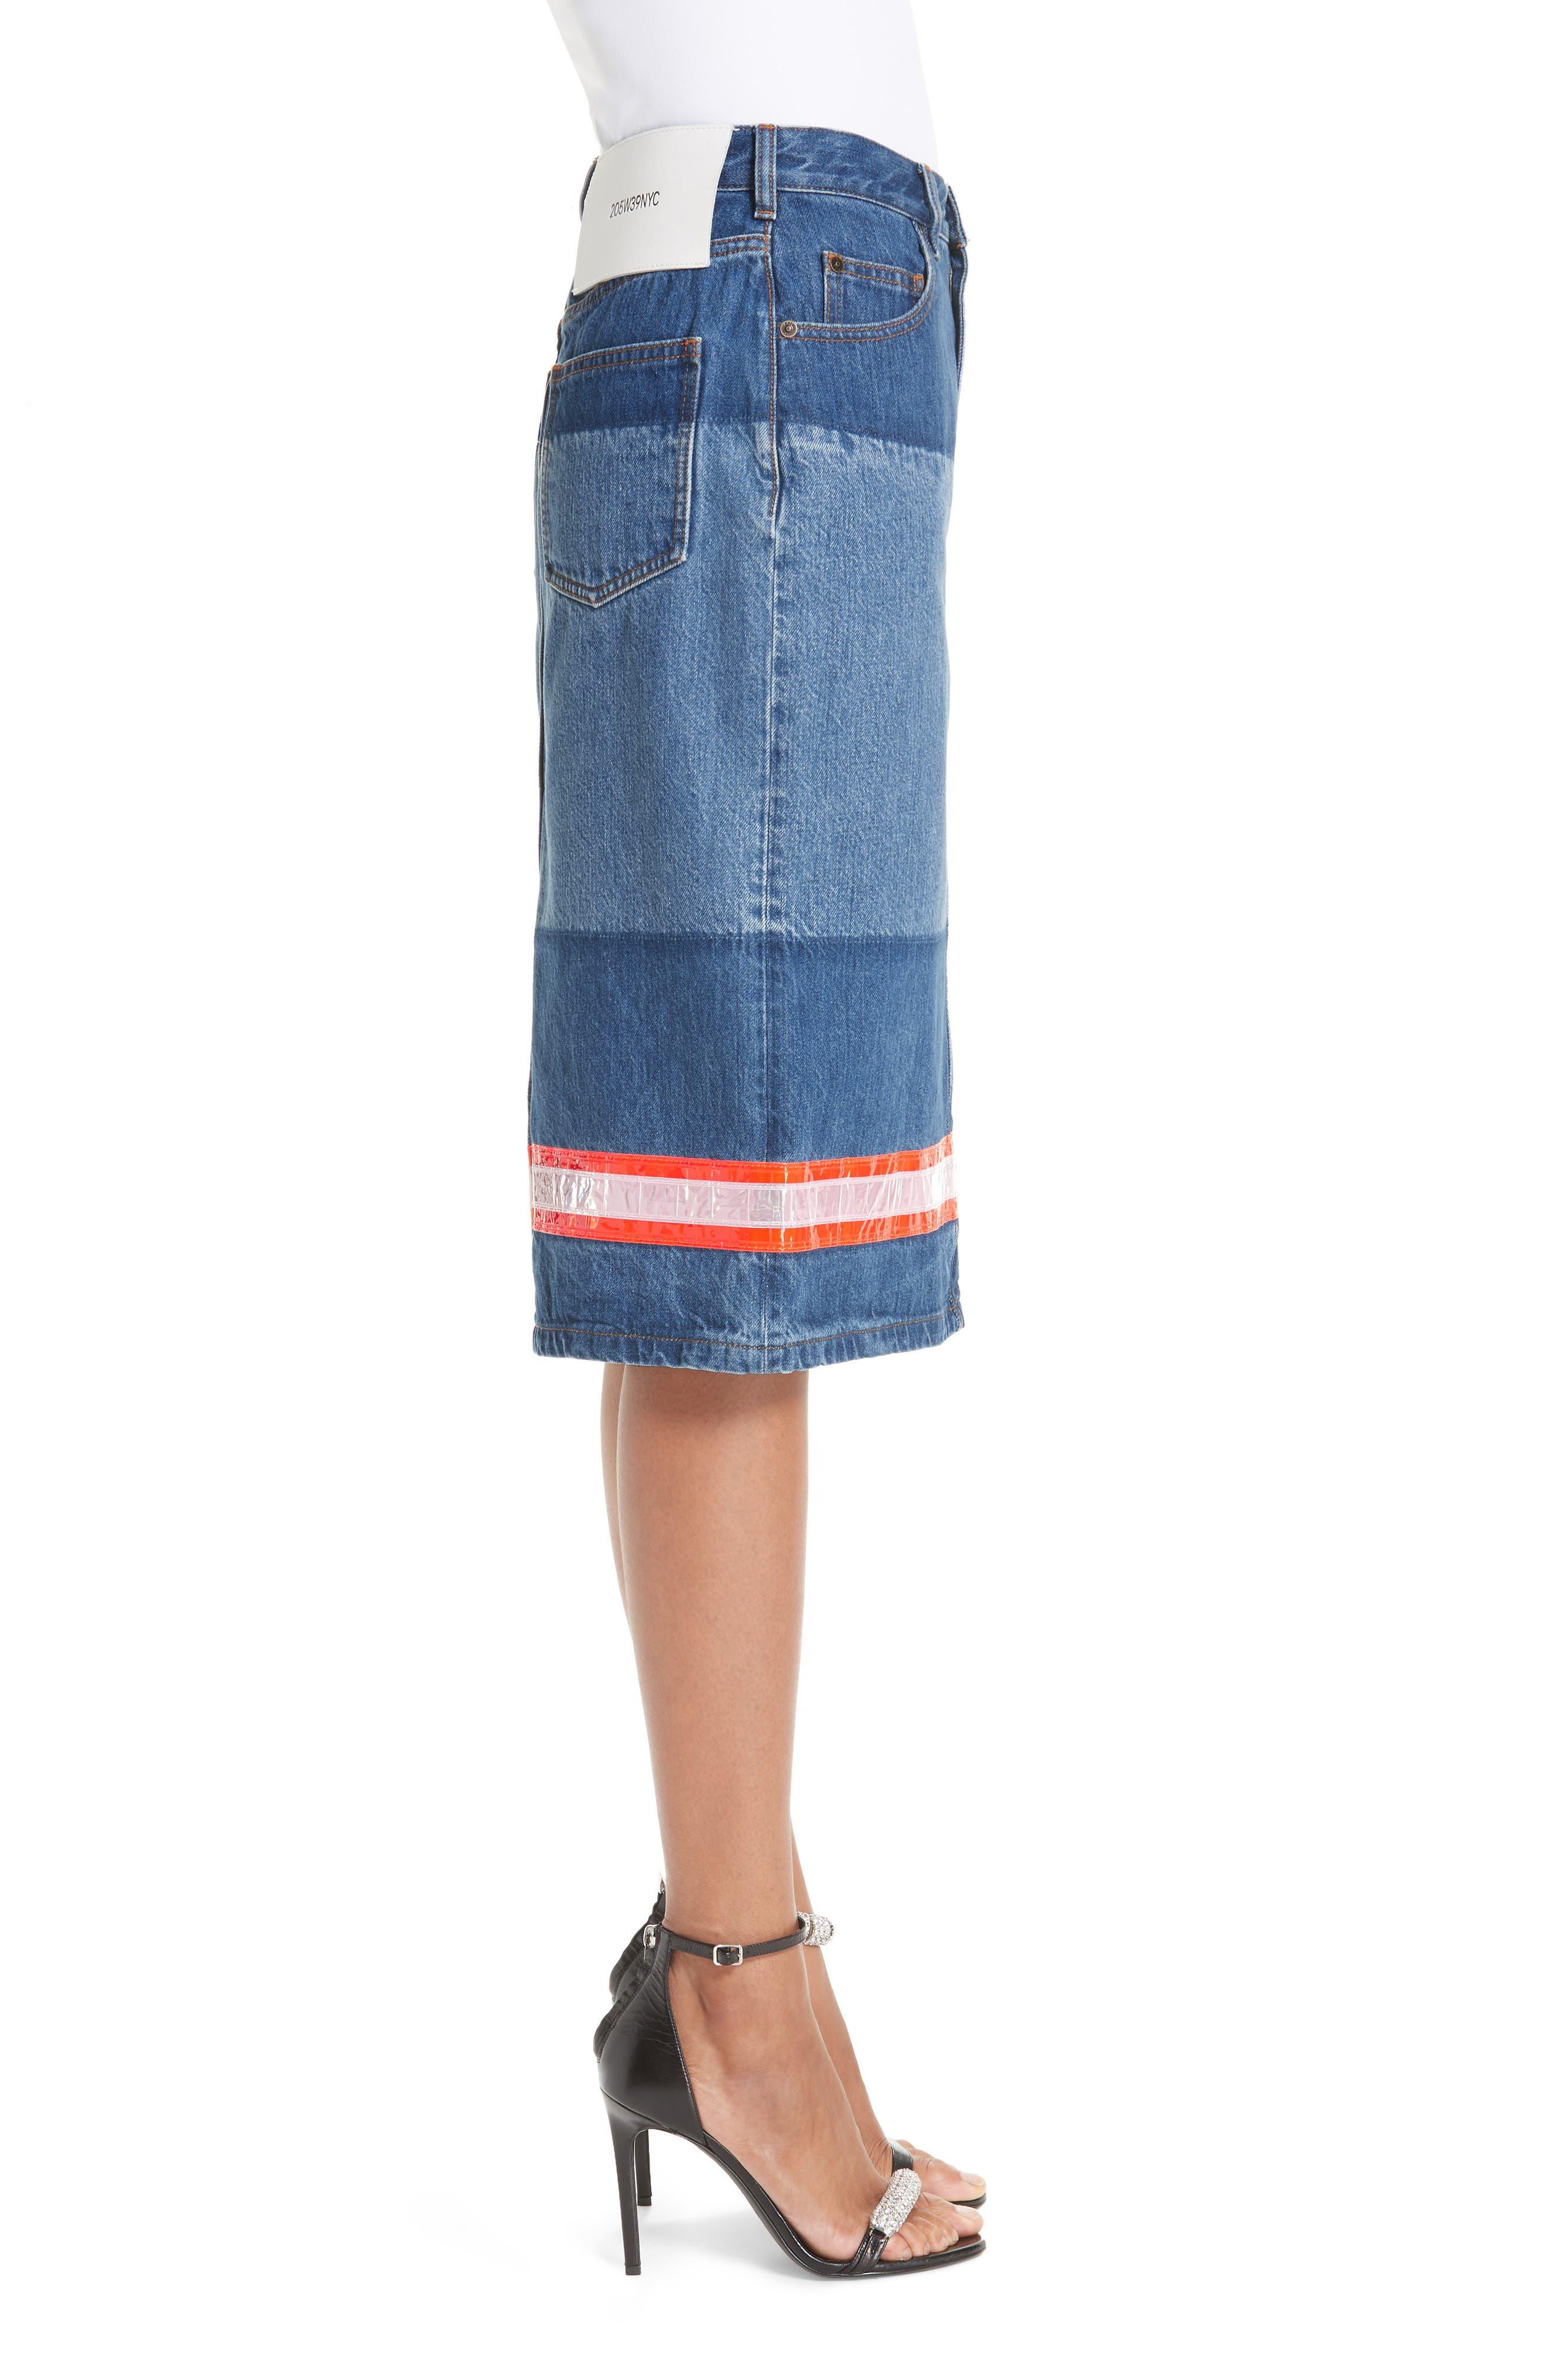 CALVIN KLEIN 205W39NYC,                             Reflective Stripe Mixed Wash Denim Skirt,                             Alternate thumbnail 3, color,                             BLUE